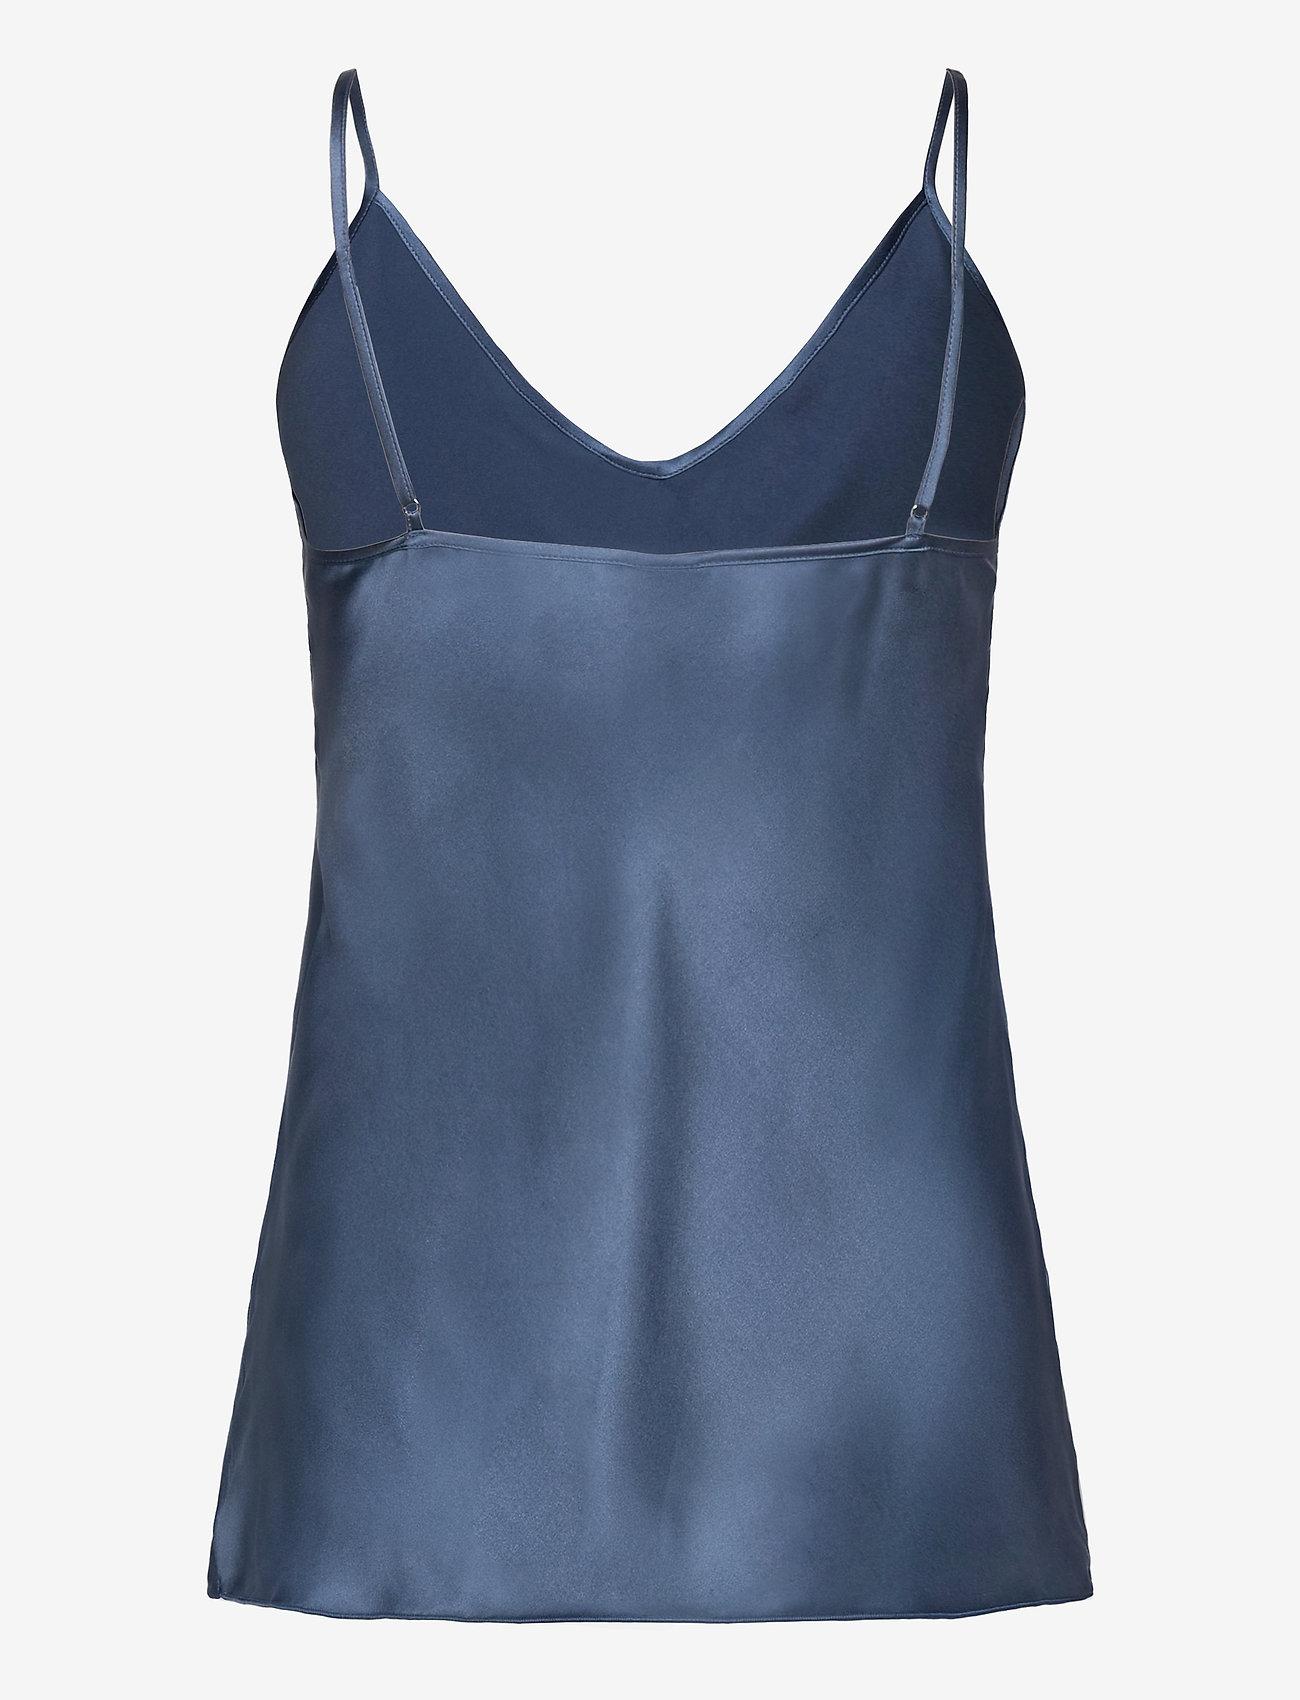 Max Mara Leisure - LUCCA - sleeveless blouses - ultramarine - 1